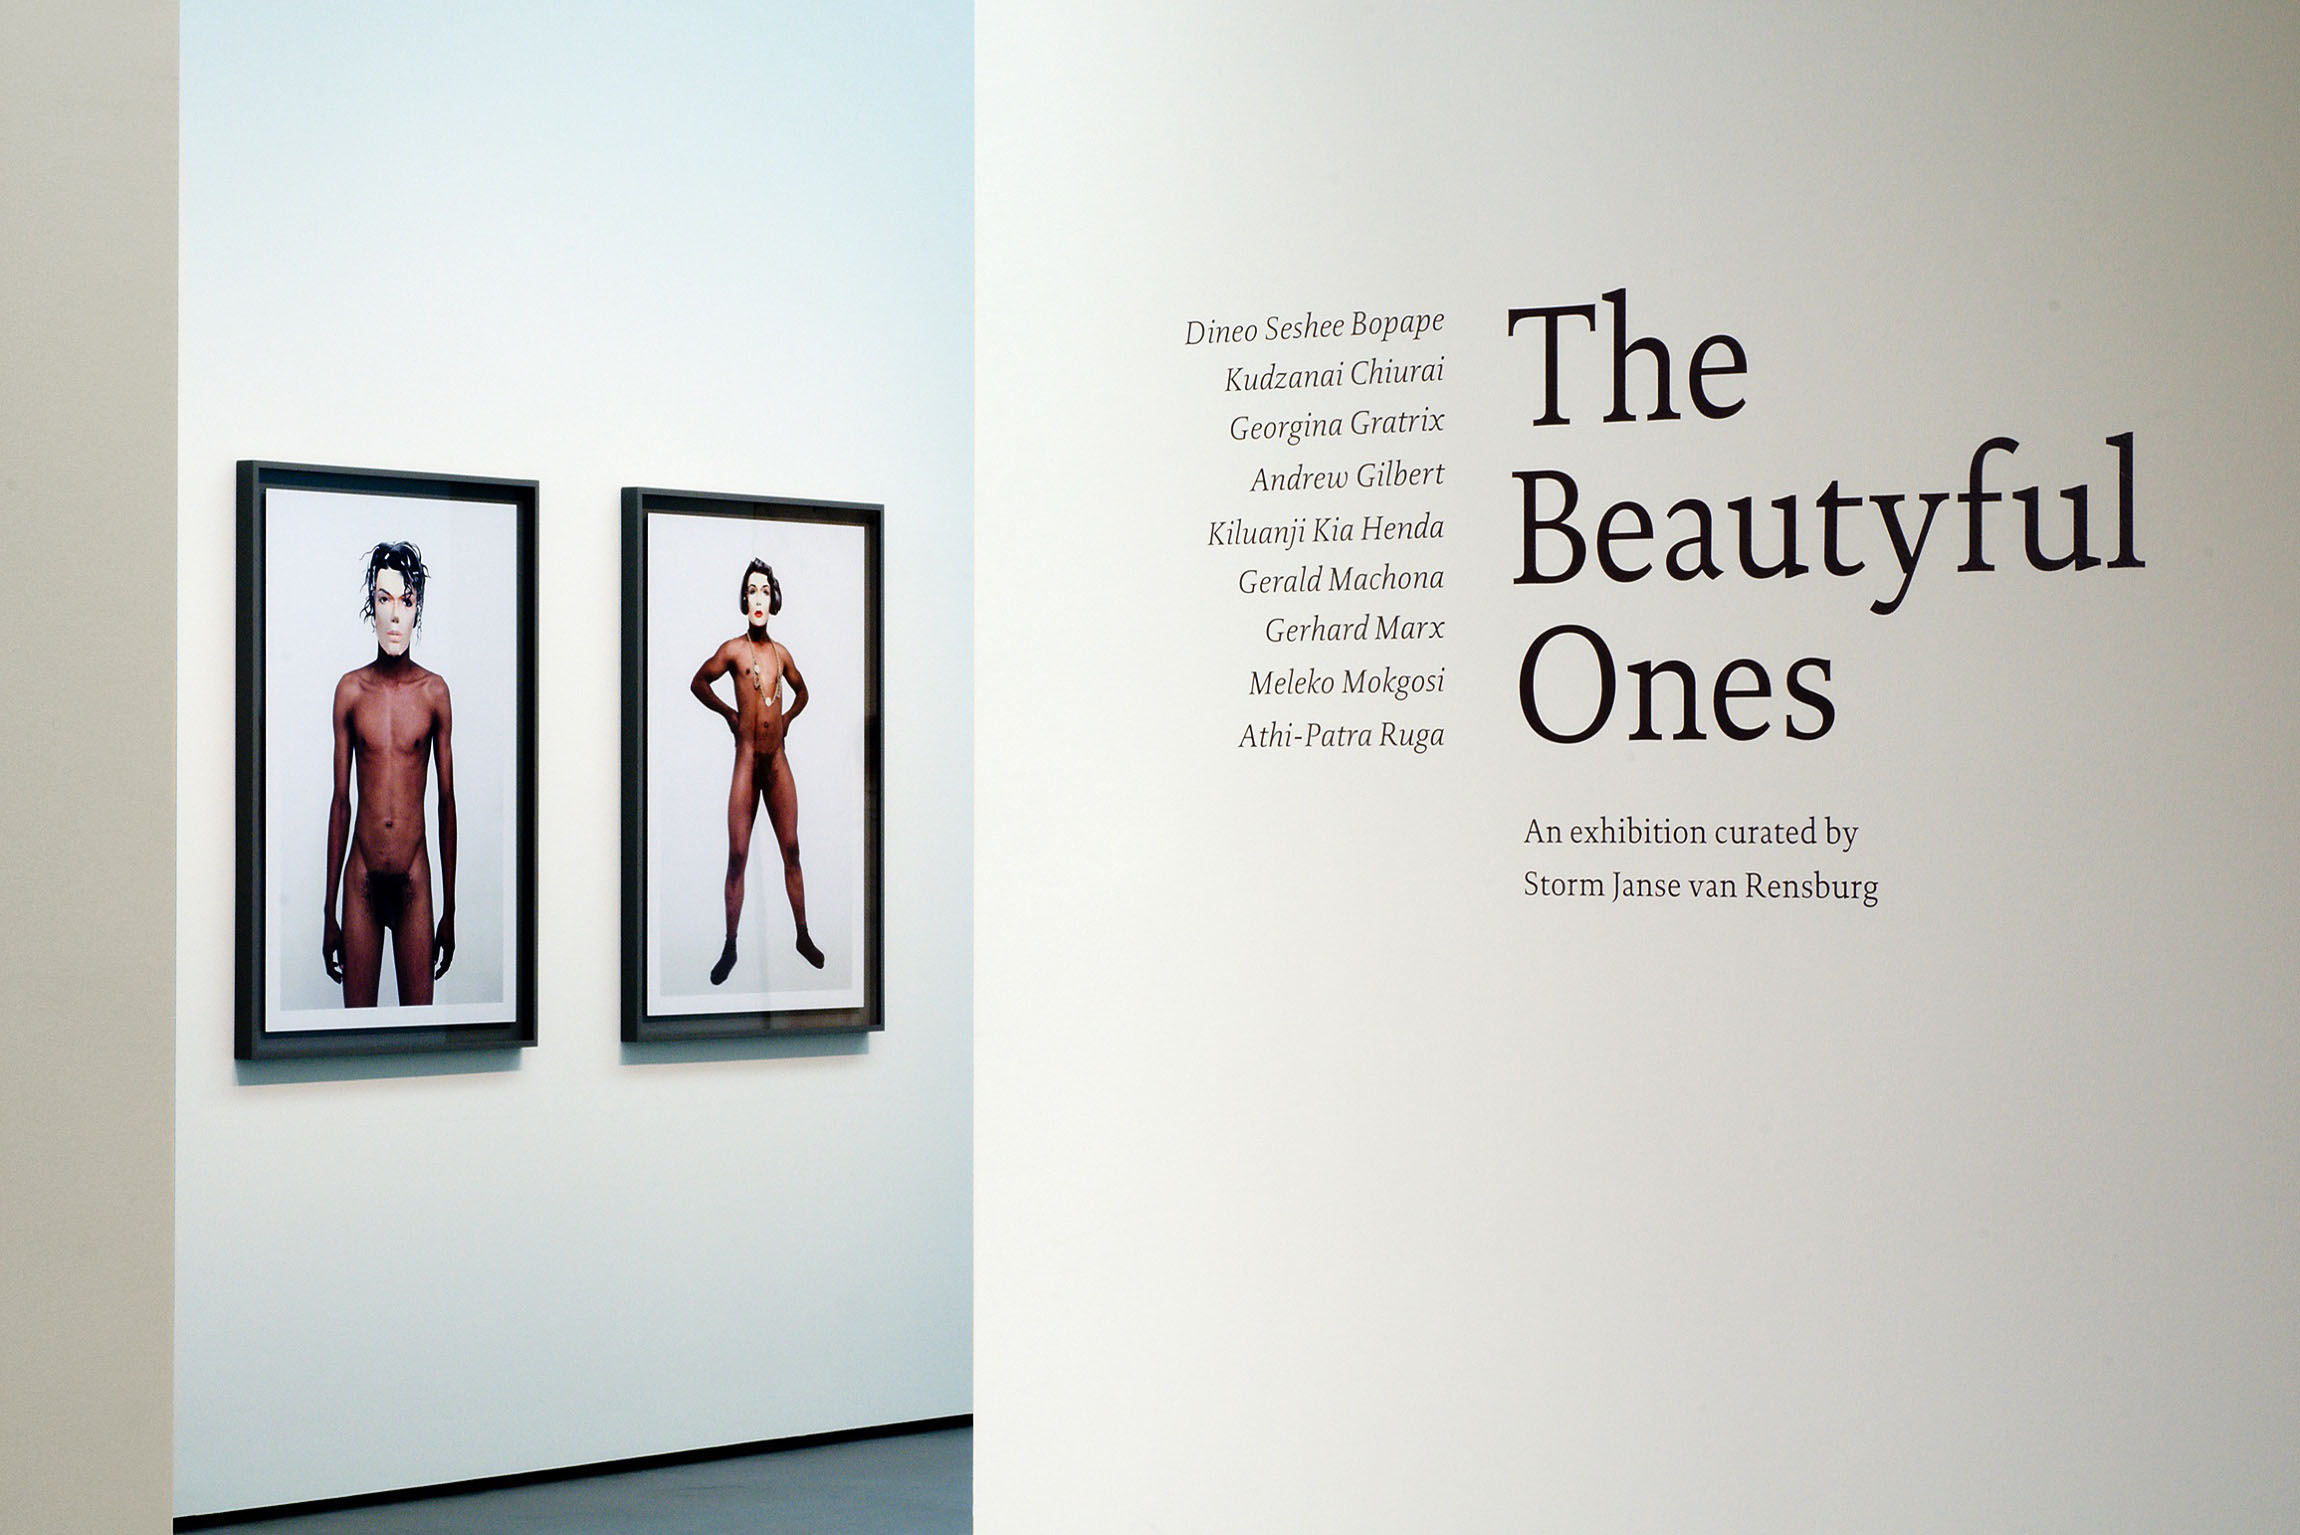 2013 The Beautyful Ones